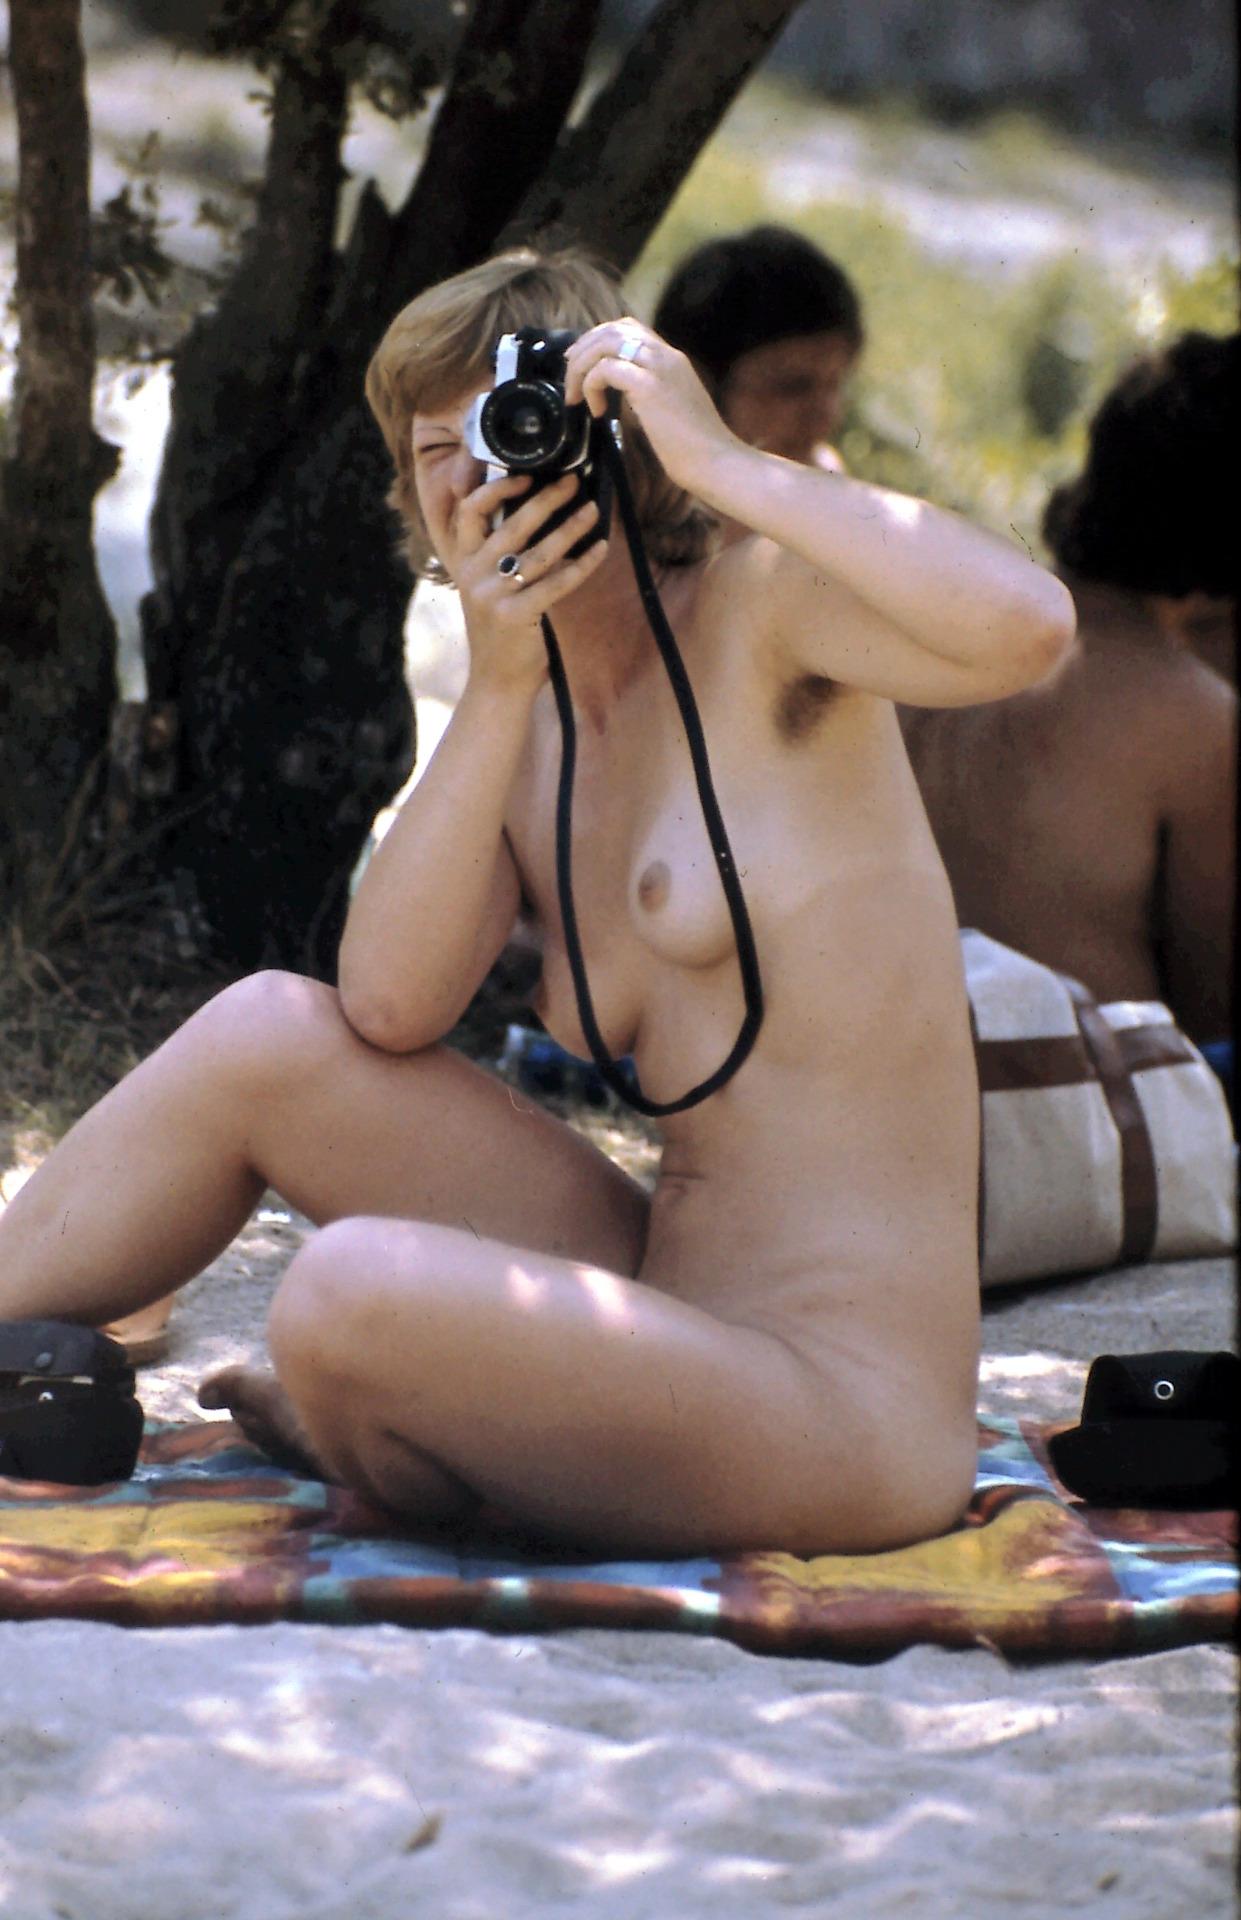 https://www.nudismlife.com/galleries/nudists_and_nude/the_most_natural_nudists/the_most_natural_nudists_0108.jpg